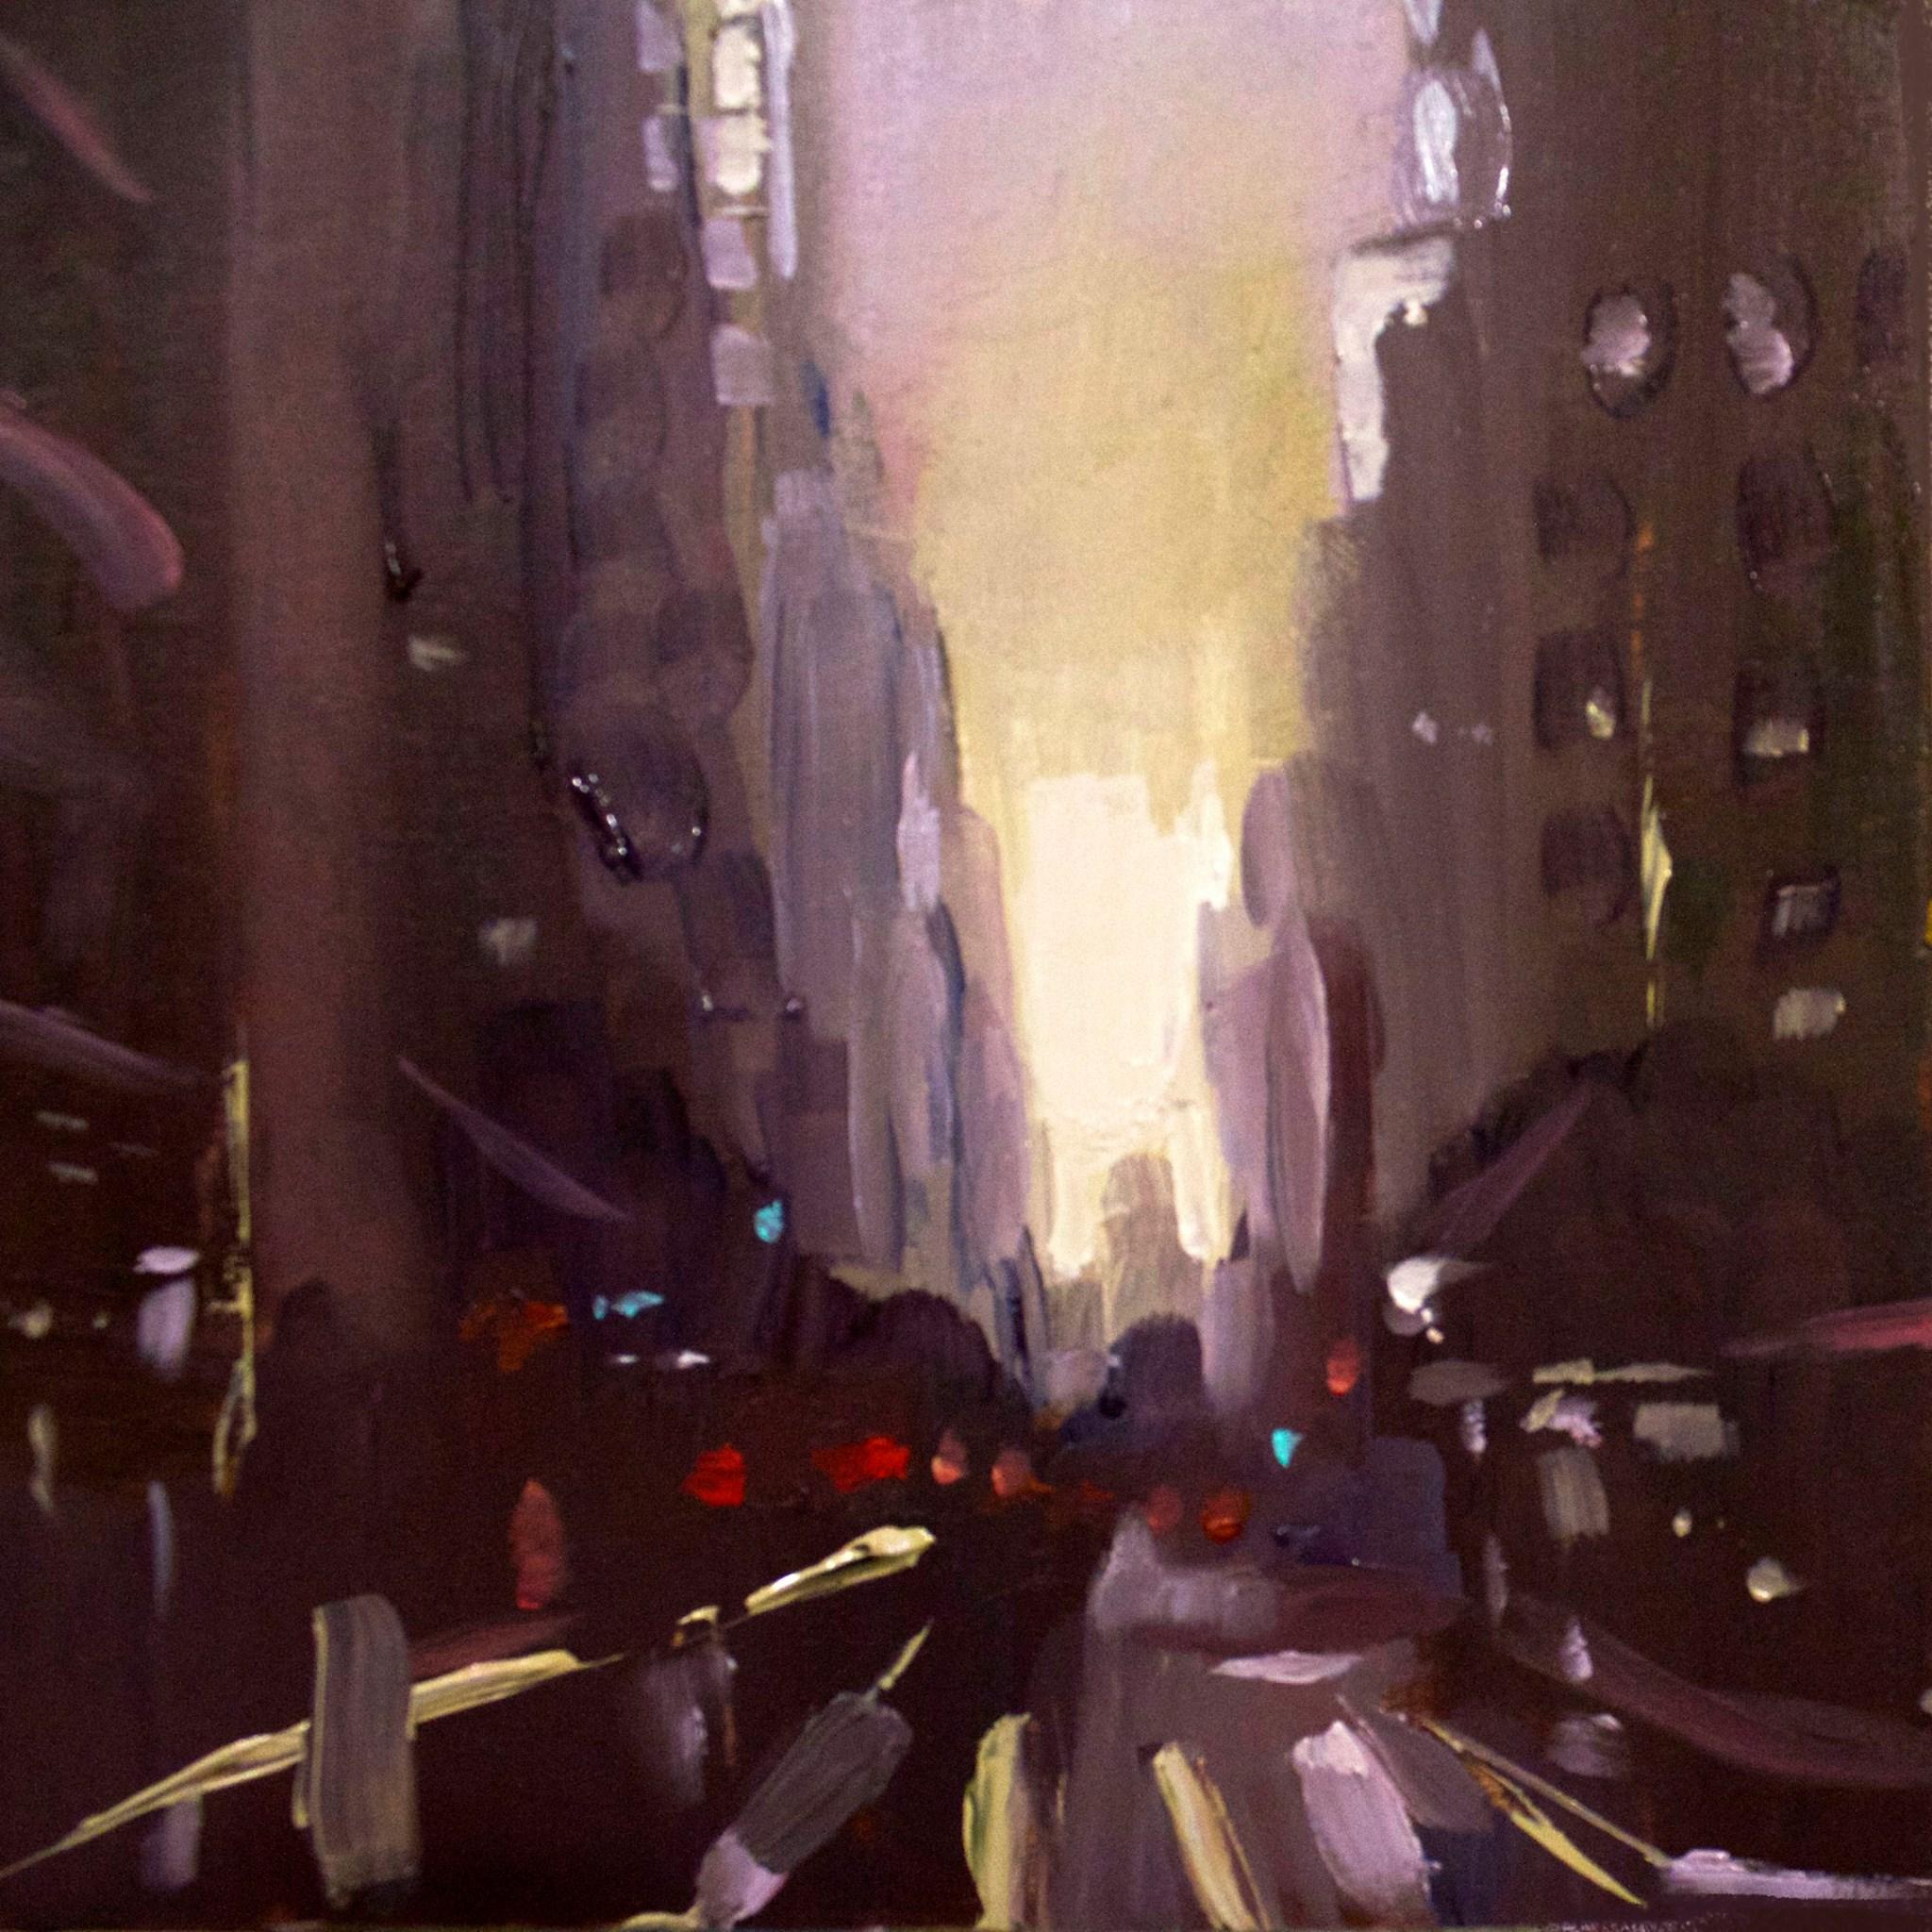 jose-alfonso-jd-alfonso-new-york-city-purple.jpg